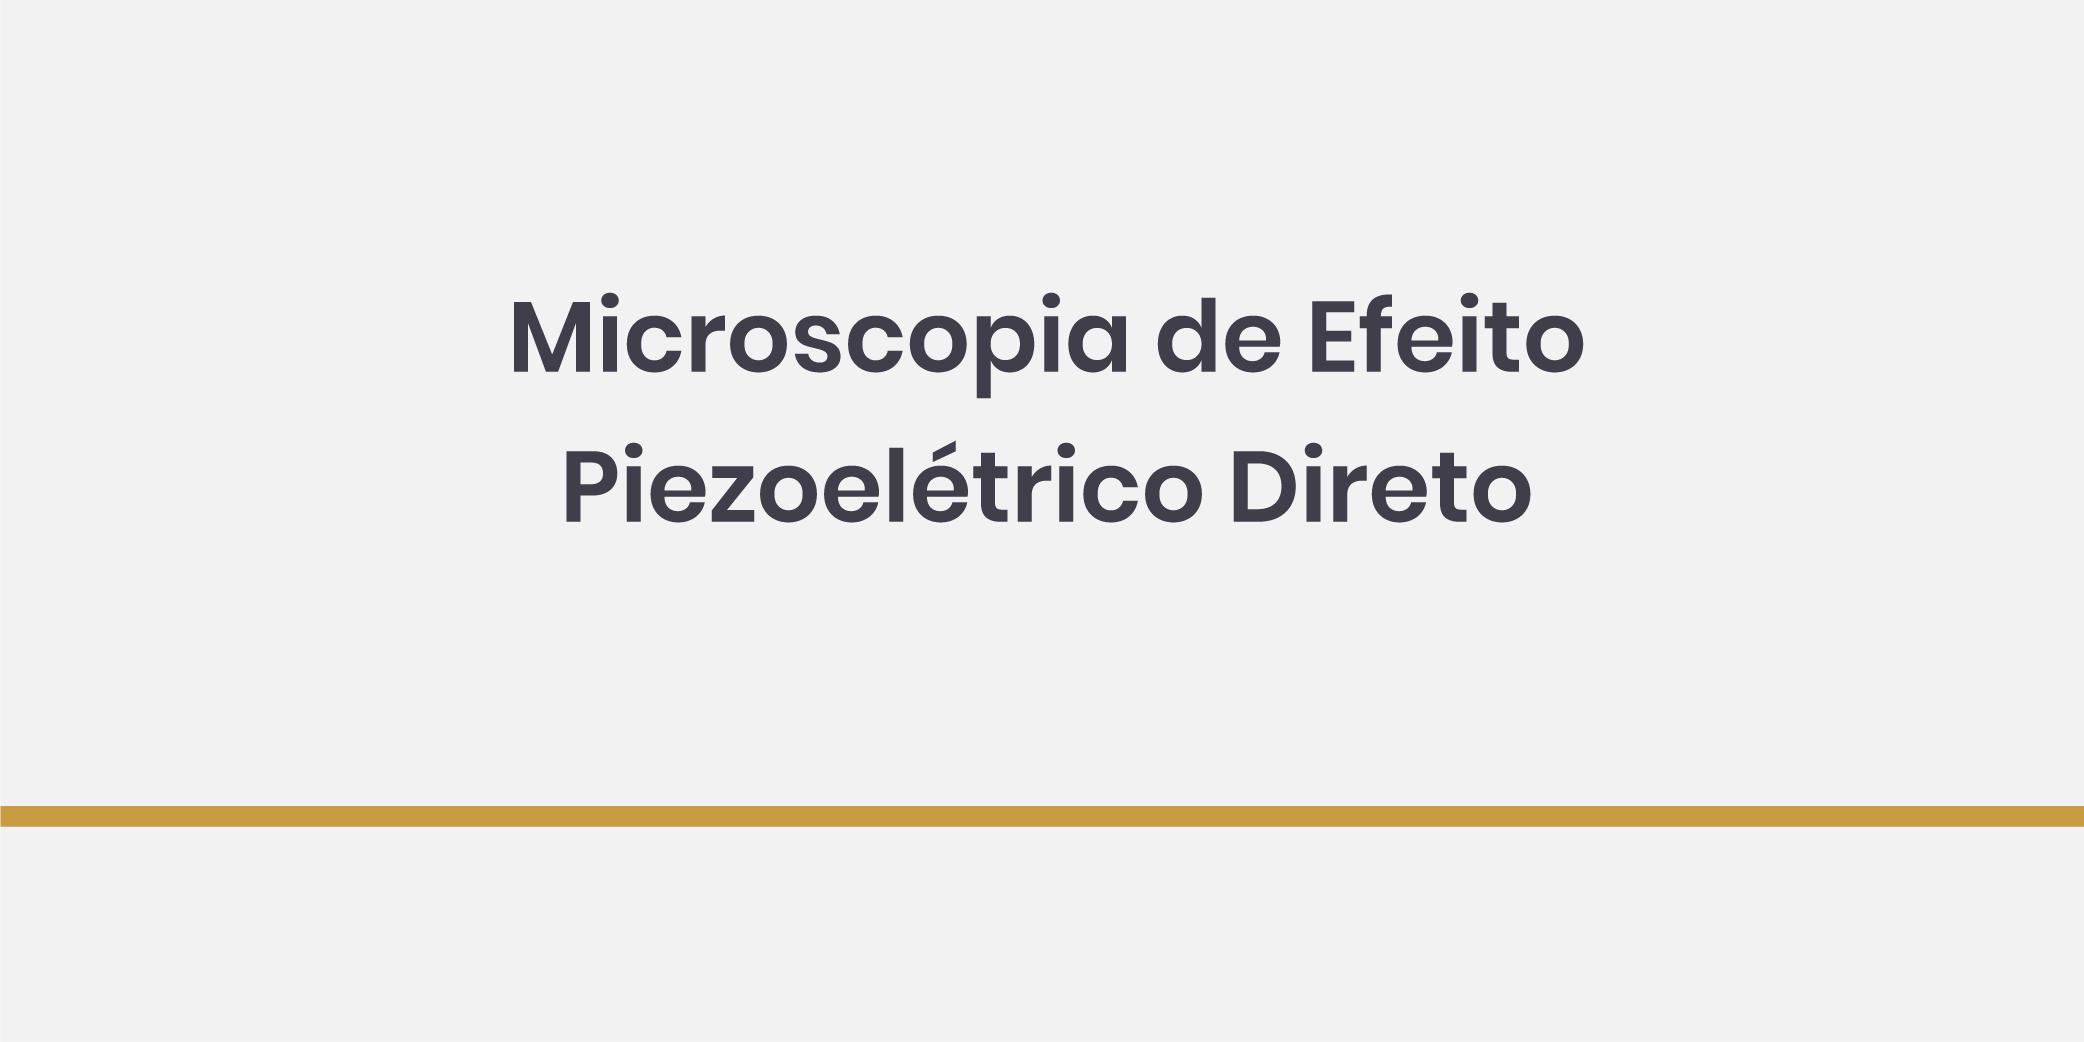 Microscopia de Efeito Piezoelétrico Direto